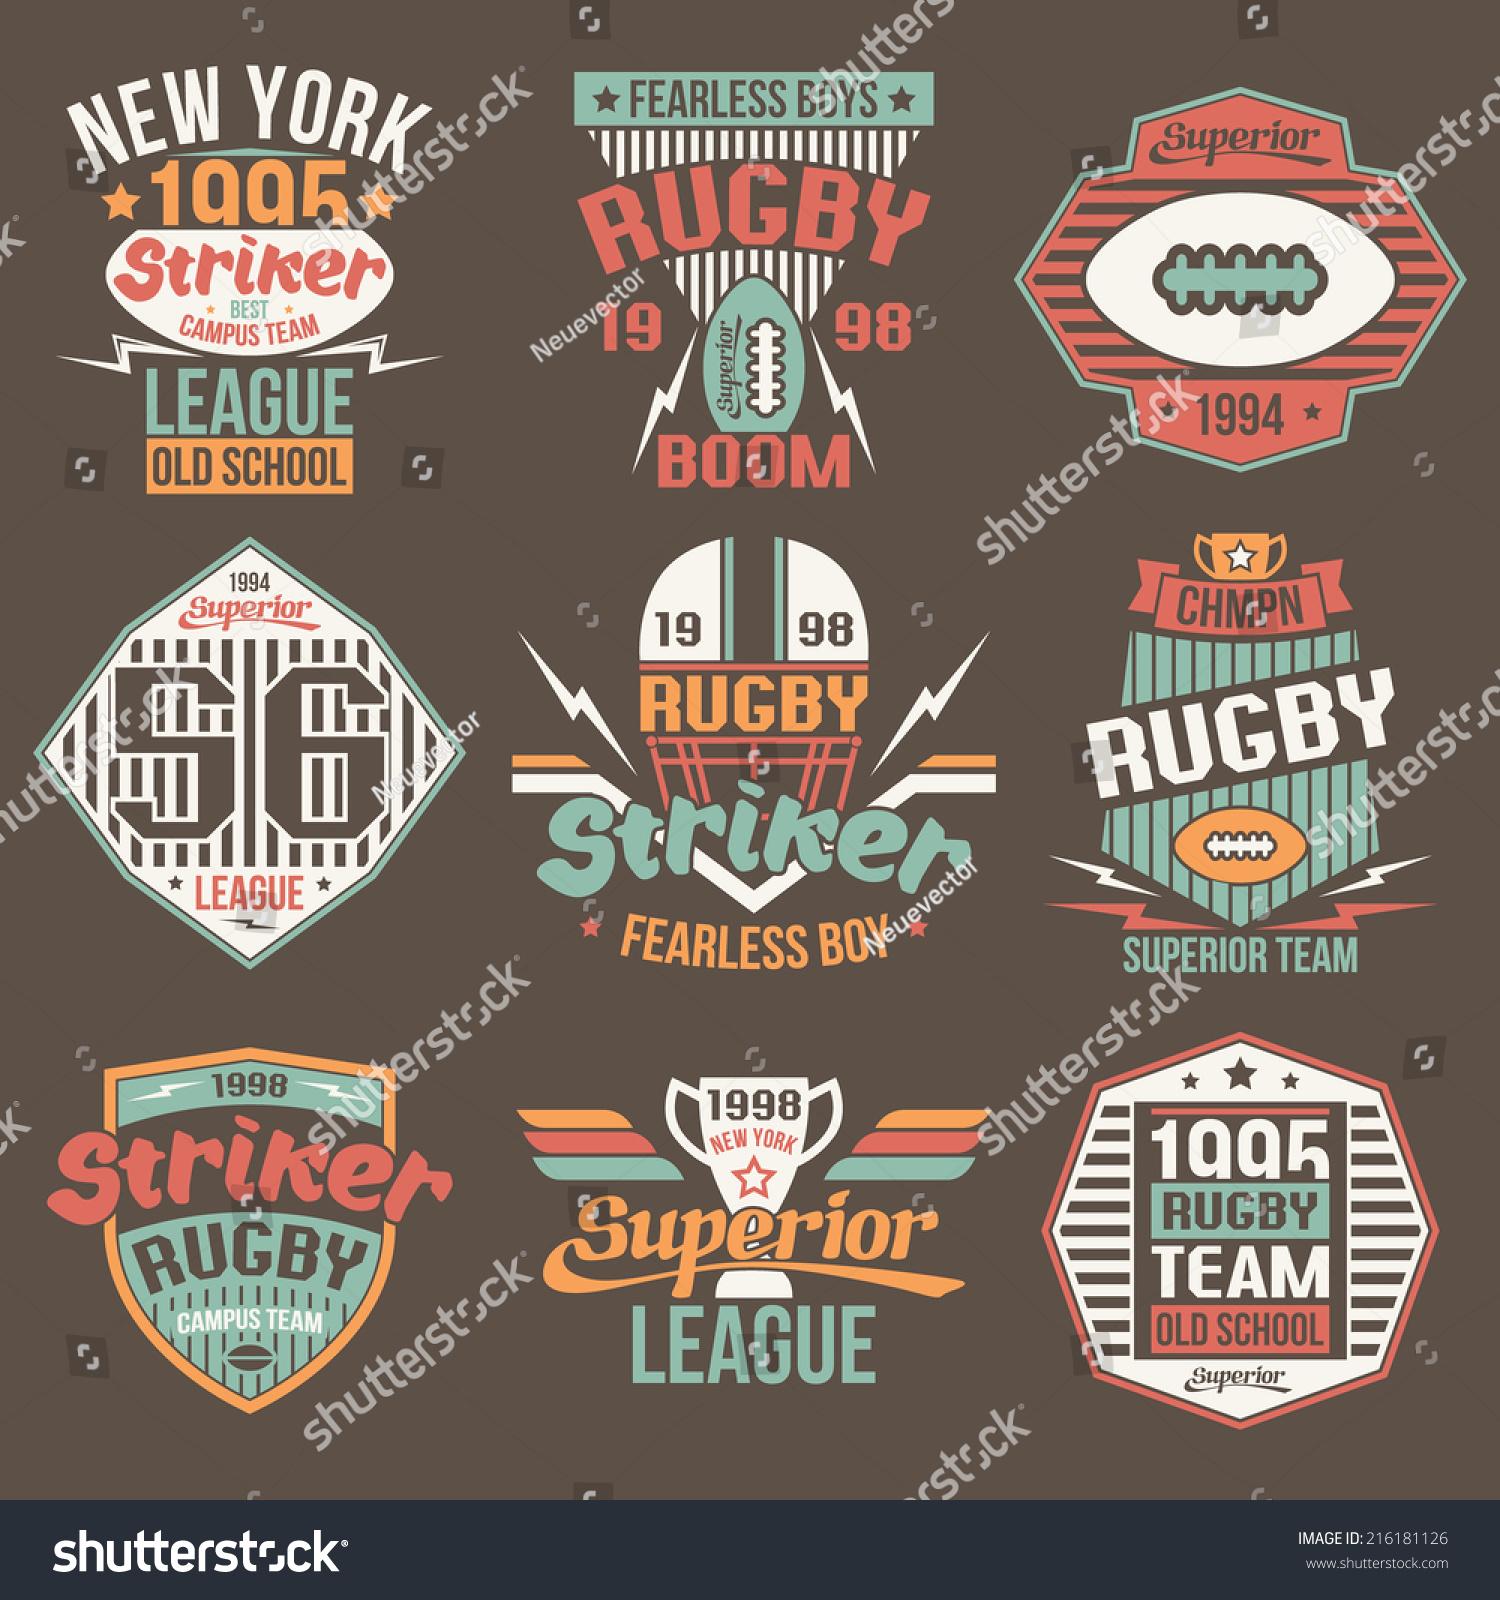 College Team American Football Retro Vintage Stock Vector